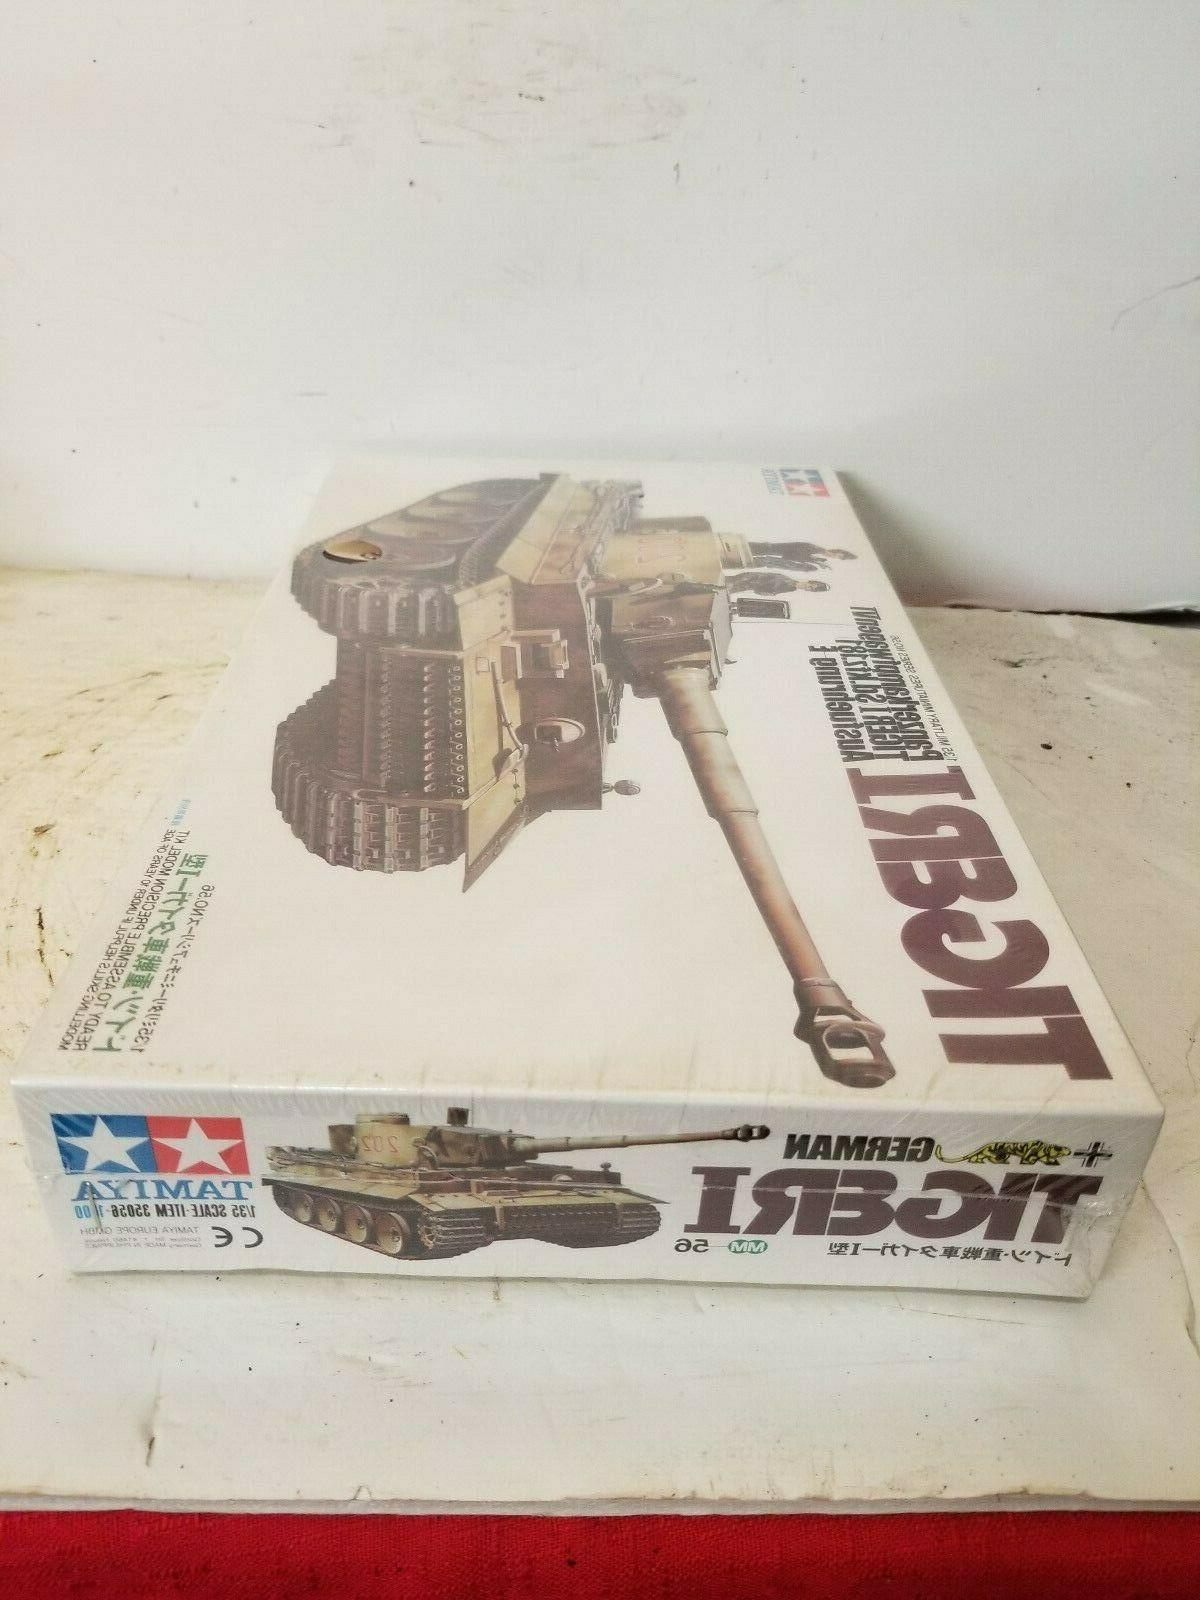 TAMIYA WWII Model TIGER 1 1/35 SCALE